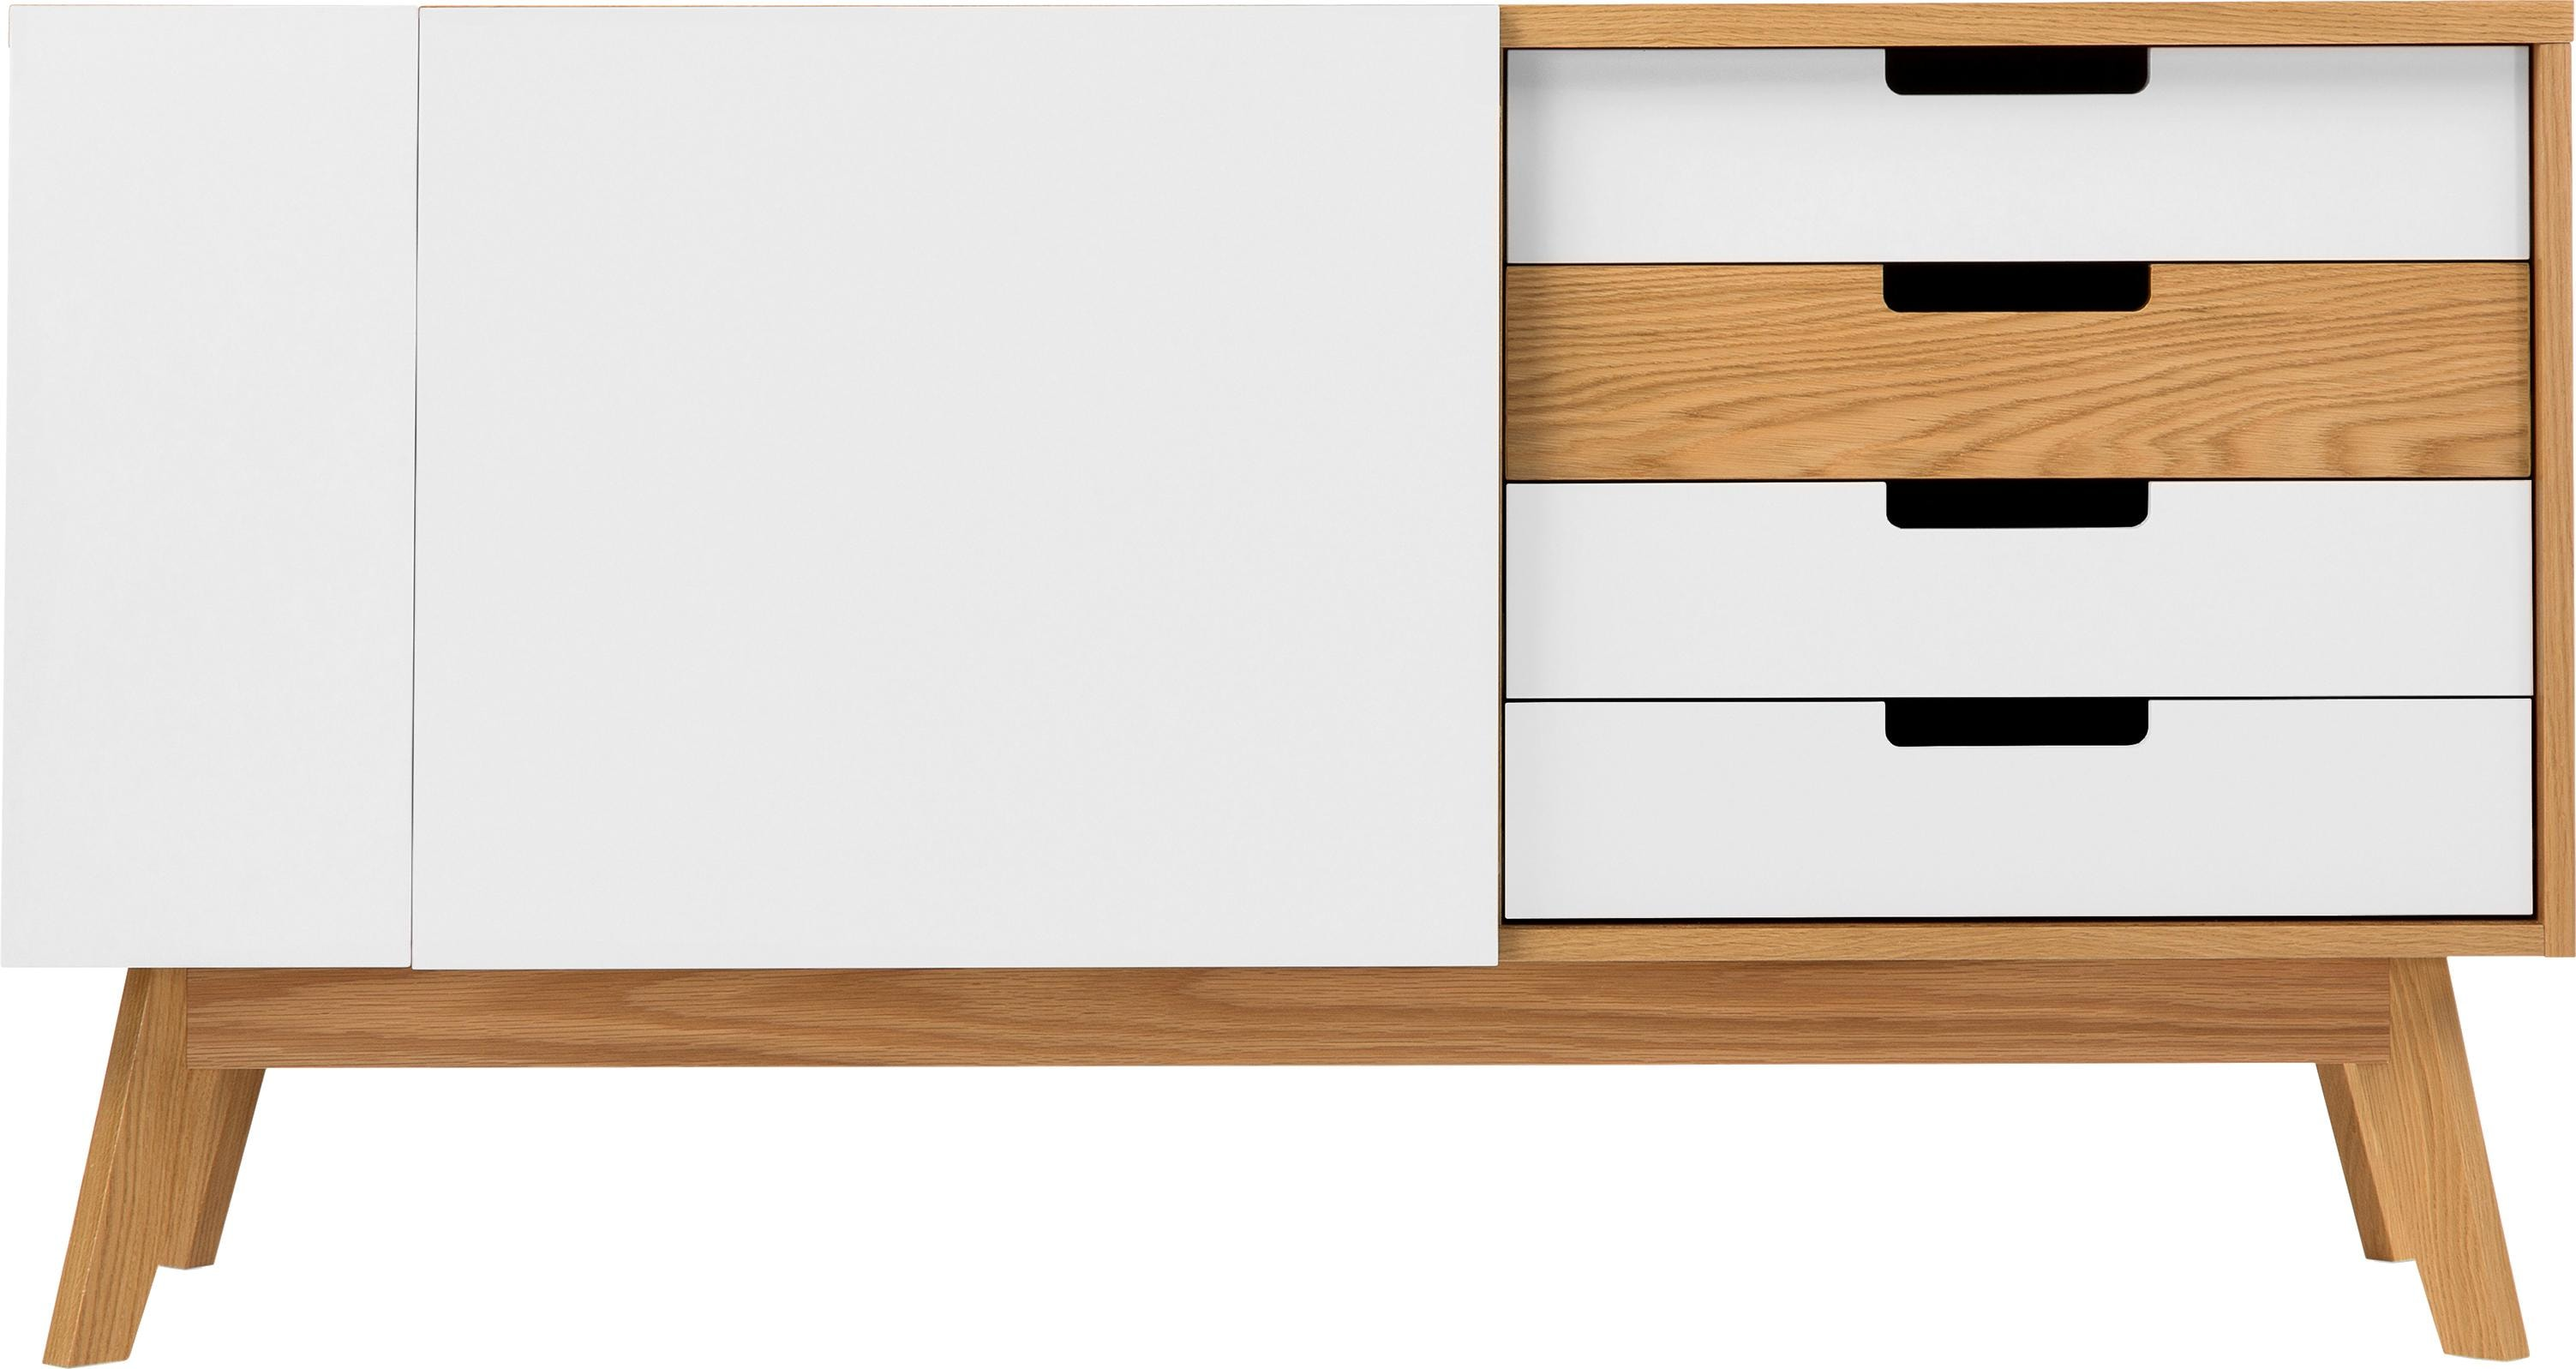 Woodman Estera Sideboard Breite 135 cm